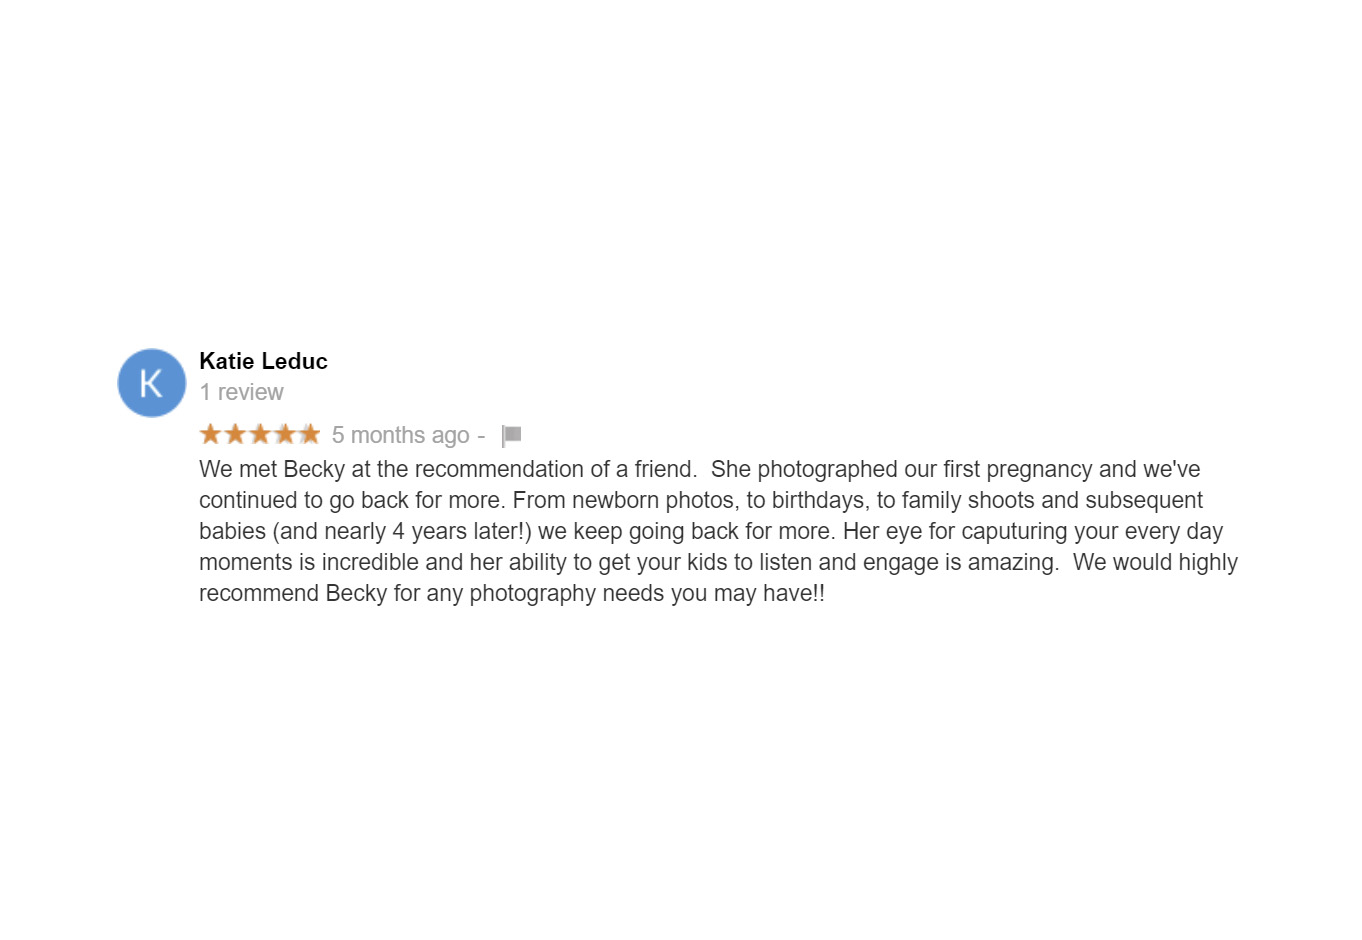 reviews_0002_Layer 43.jpg